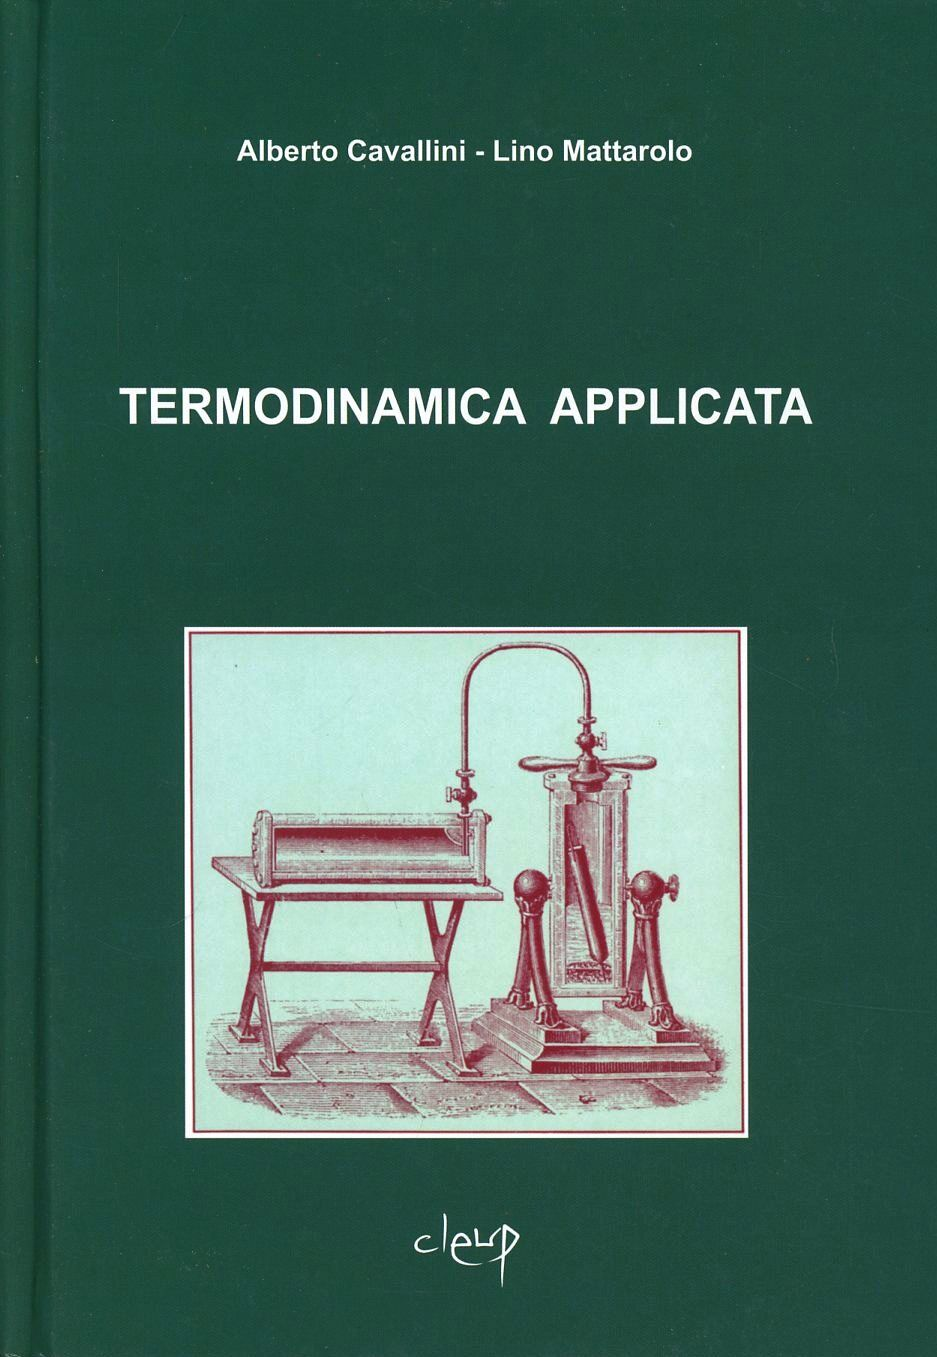 Termodinamica applicata